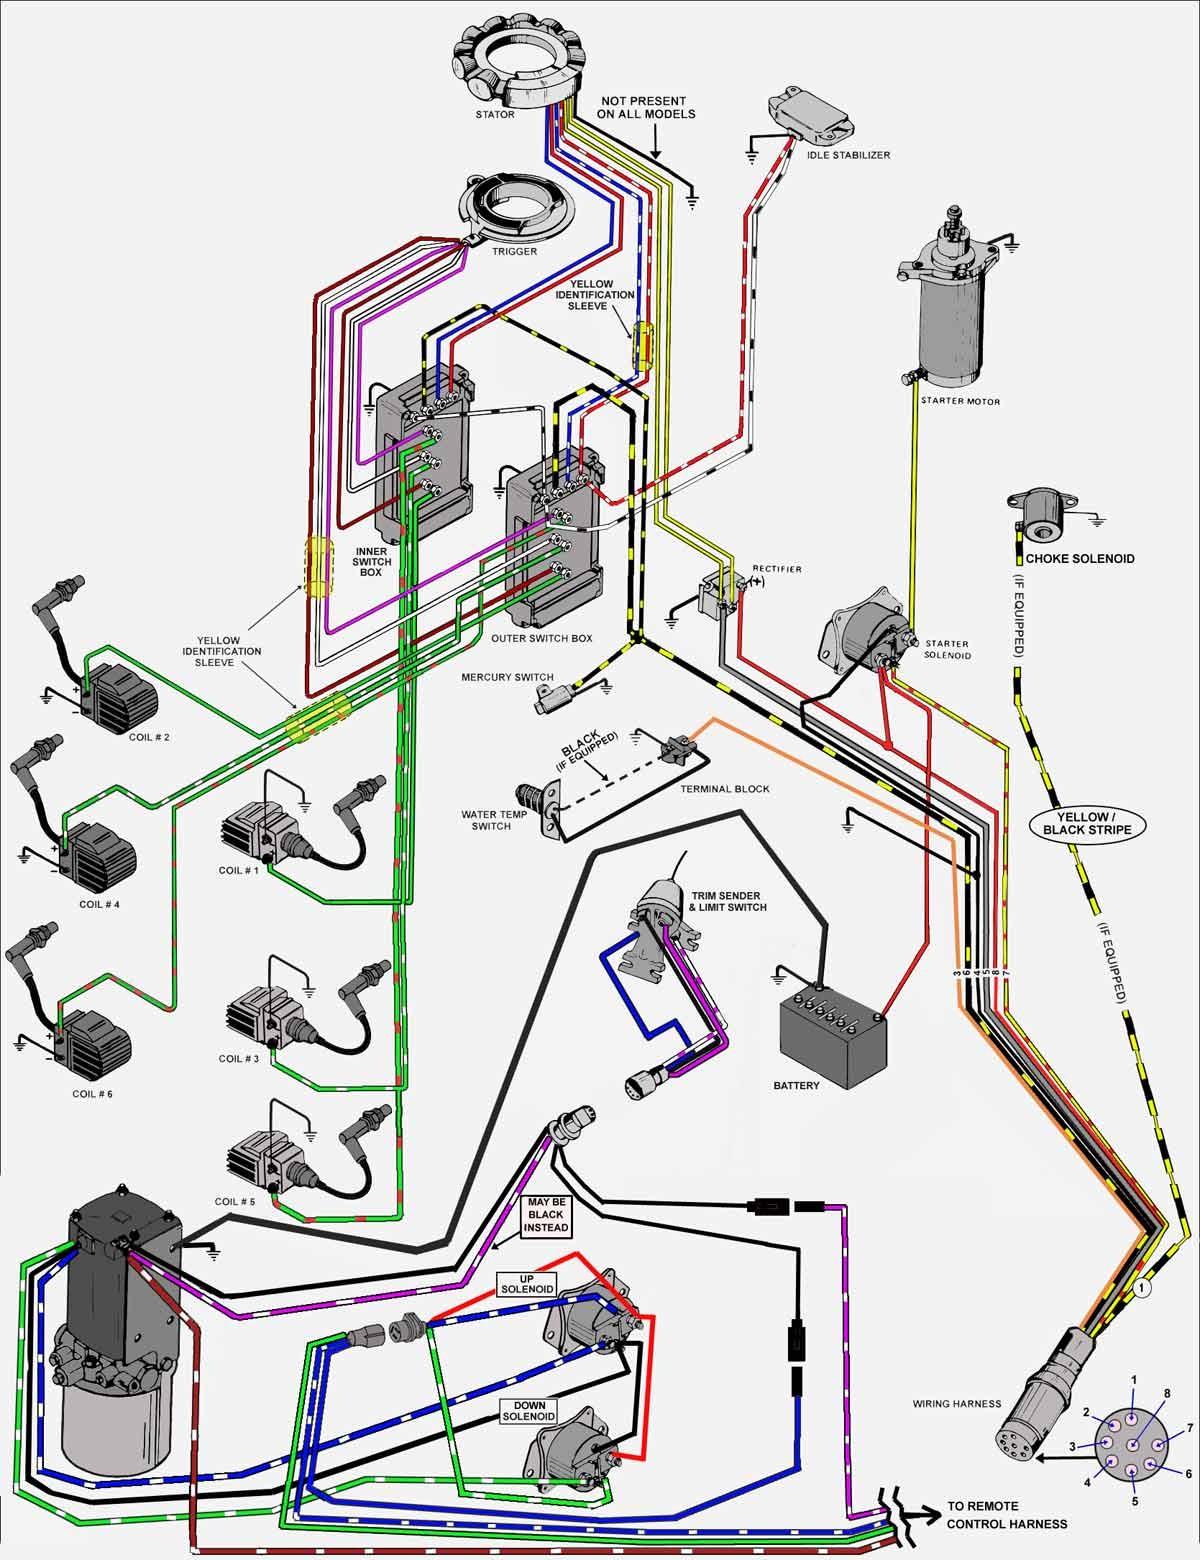 mercury mercruiser wiring schematics wiring diagrams u2022 rh  seniorlivinguniversity co 1997 Mercury Outboard Wiring Diagram Mercury